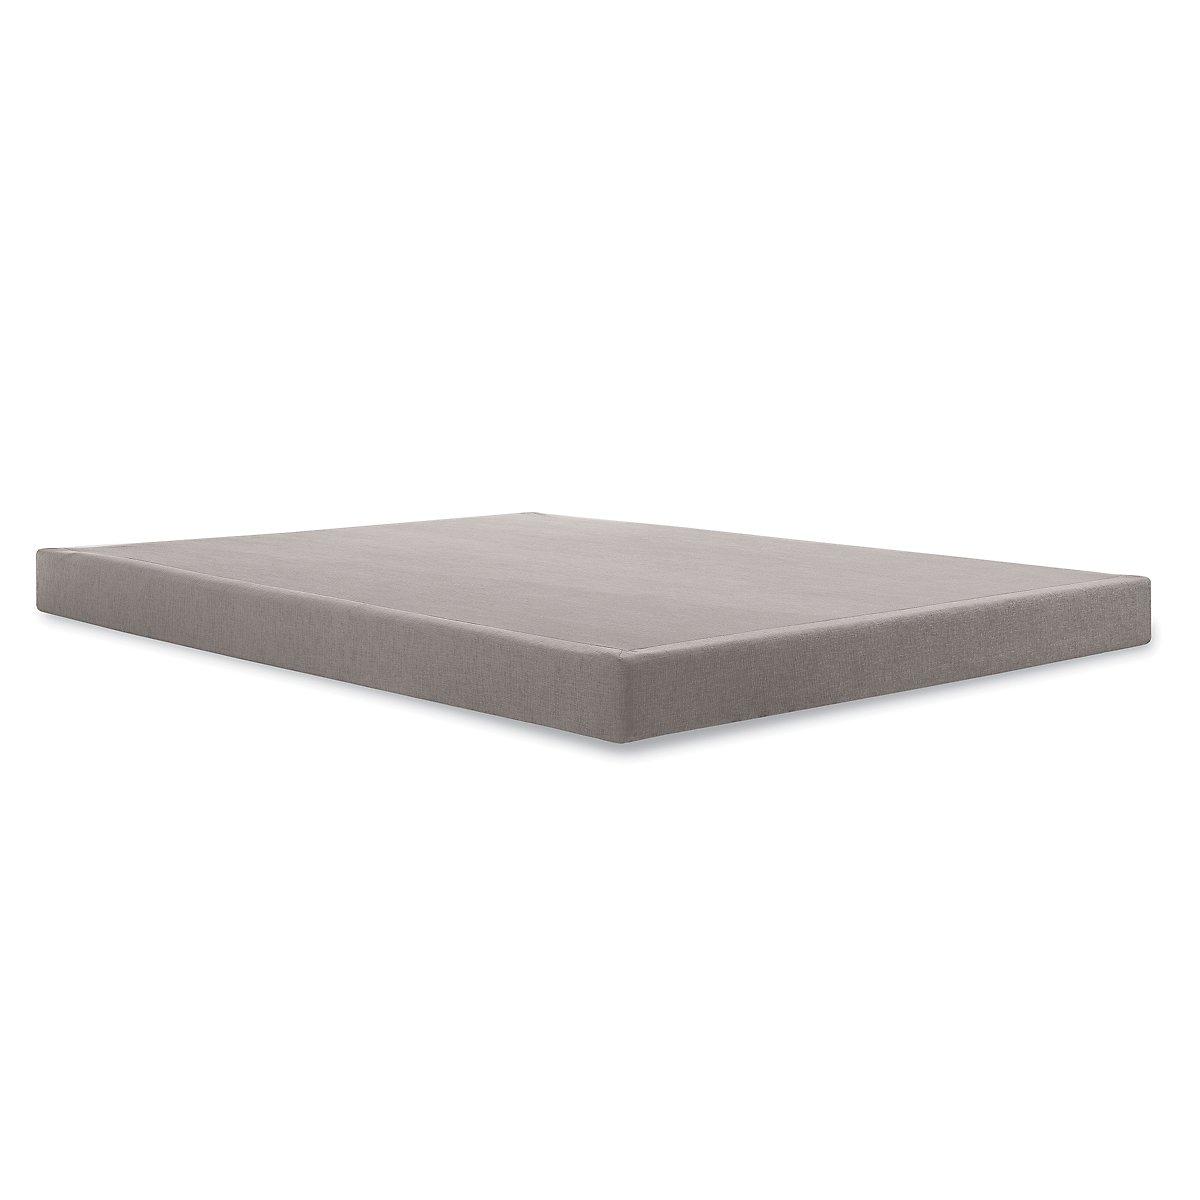 city furniture flex supreme low profile mattress set. Black Bedroom Furniture Sets. Home Design Ideas